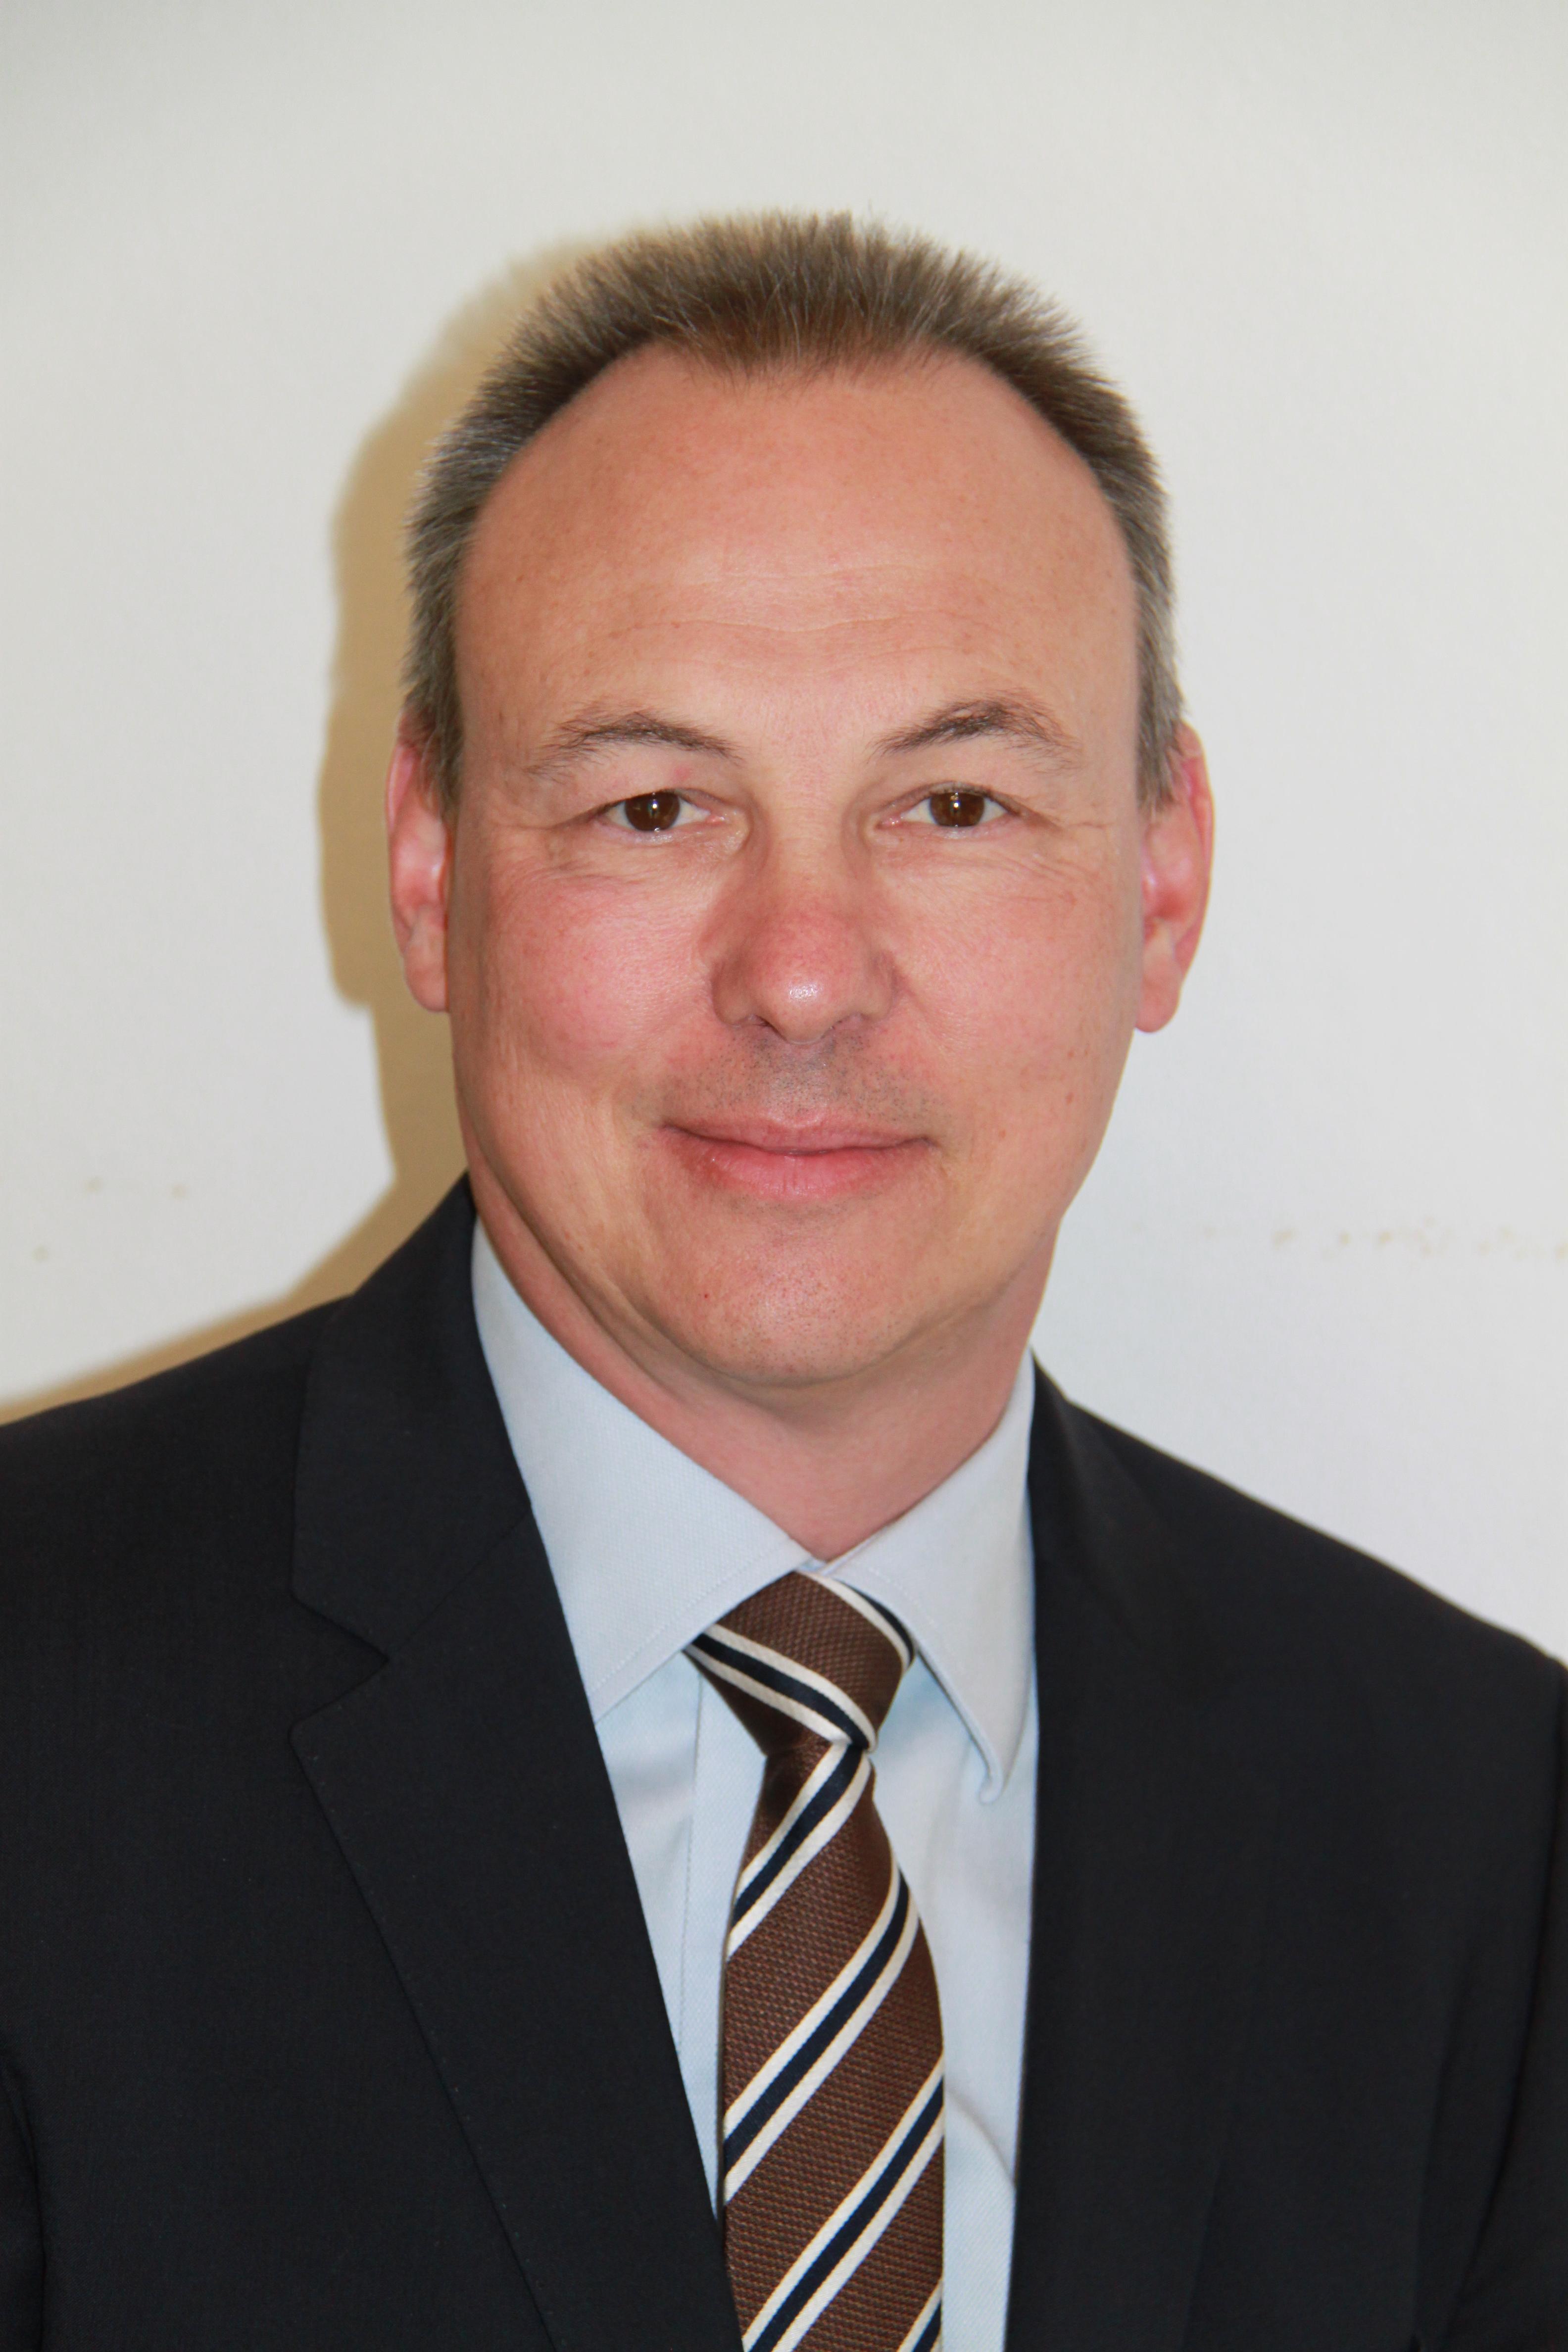 Andreas Livert, Senior Regional Director, Extreme Networks